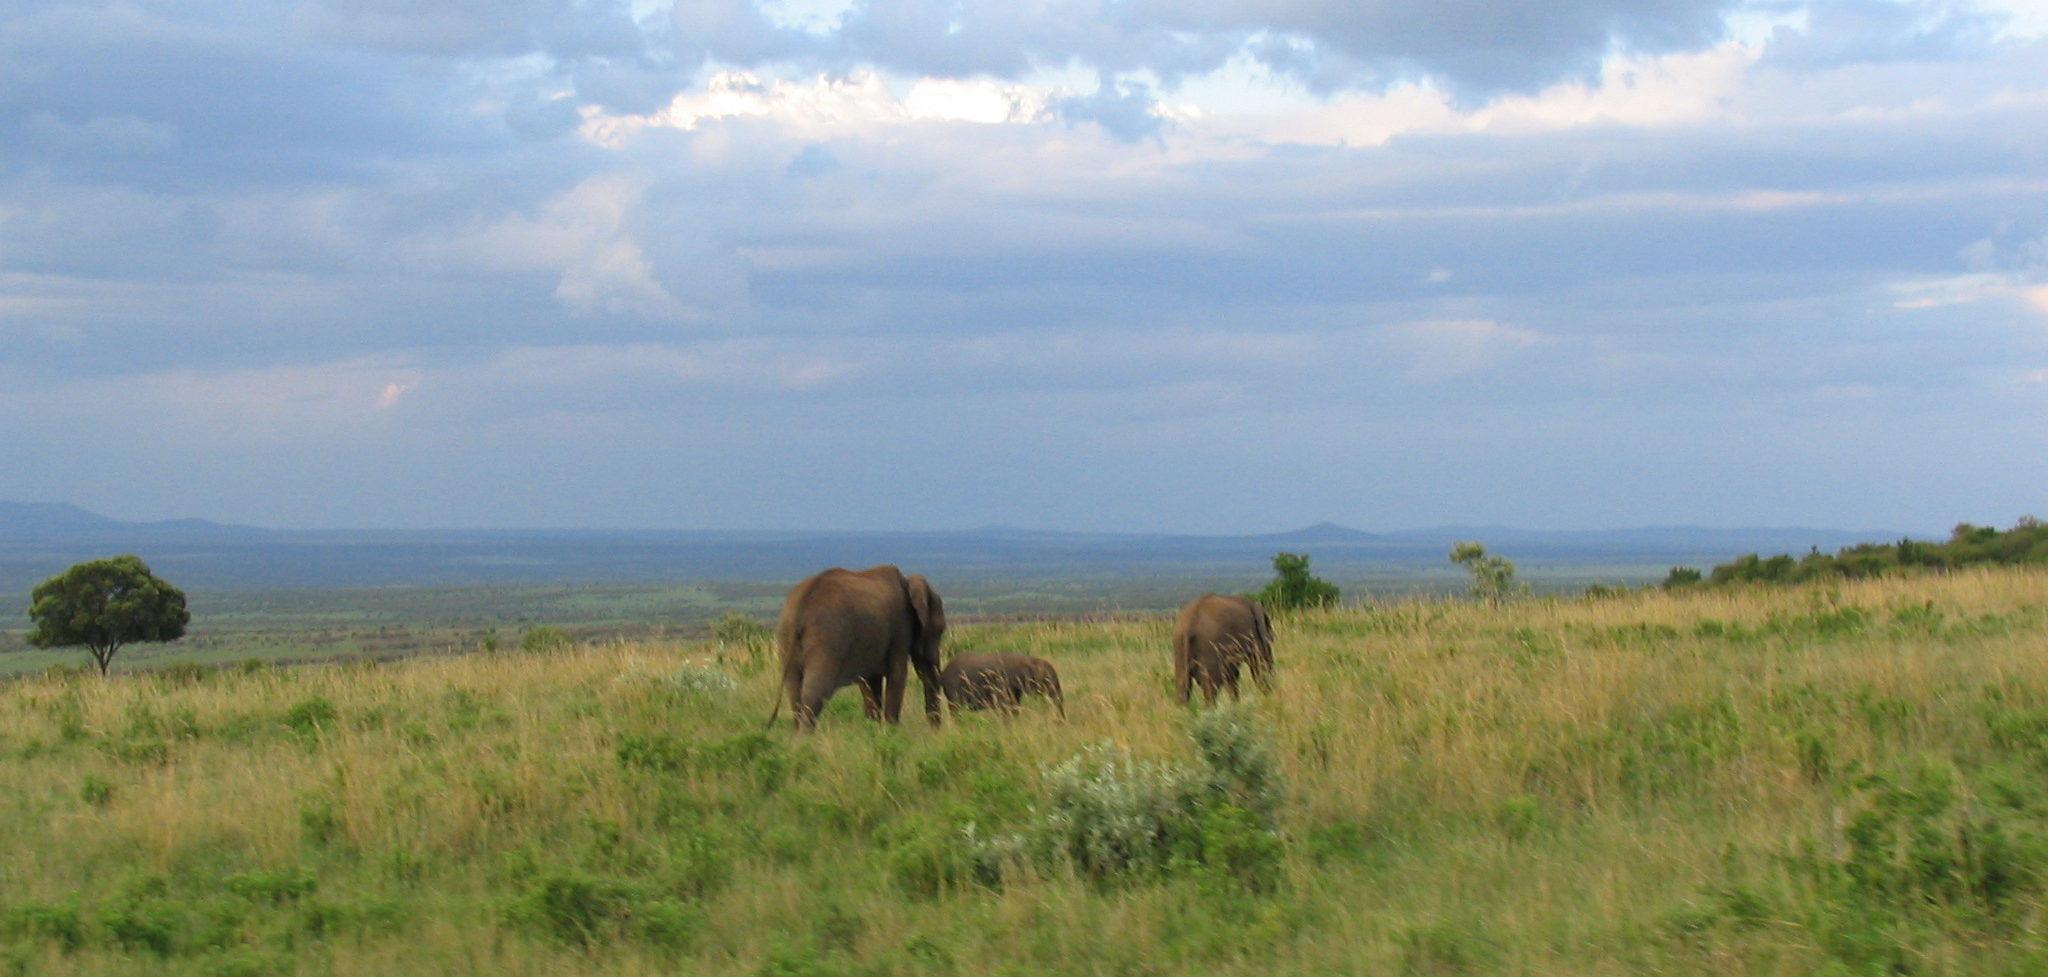 Elephants on savanna